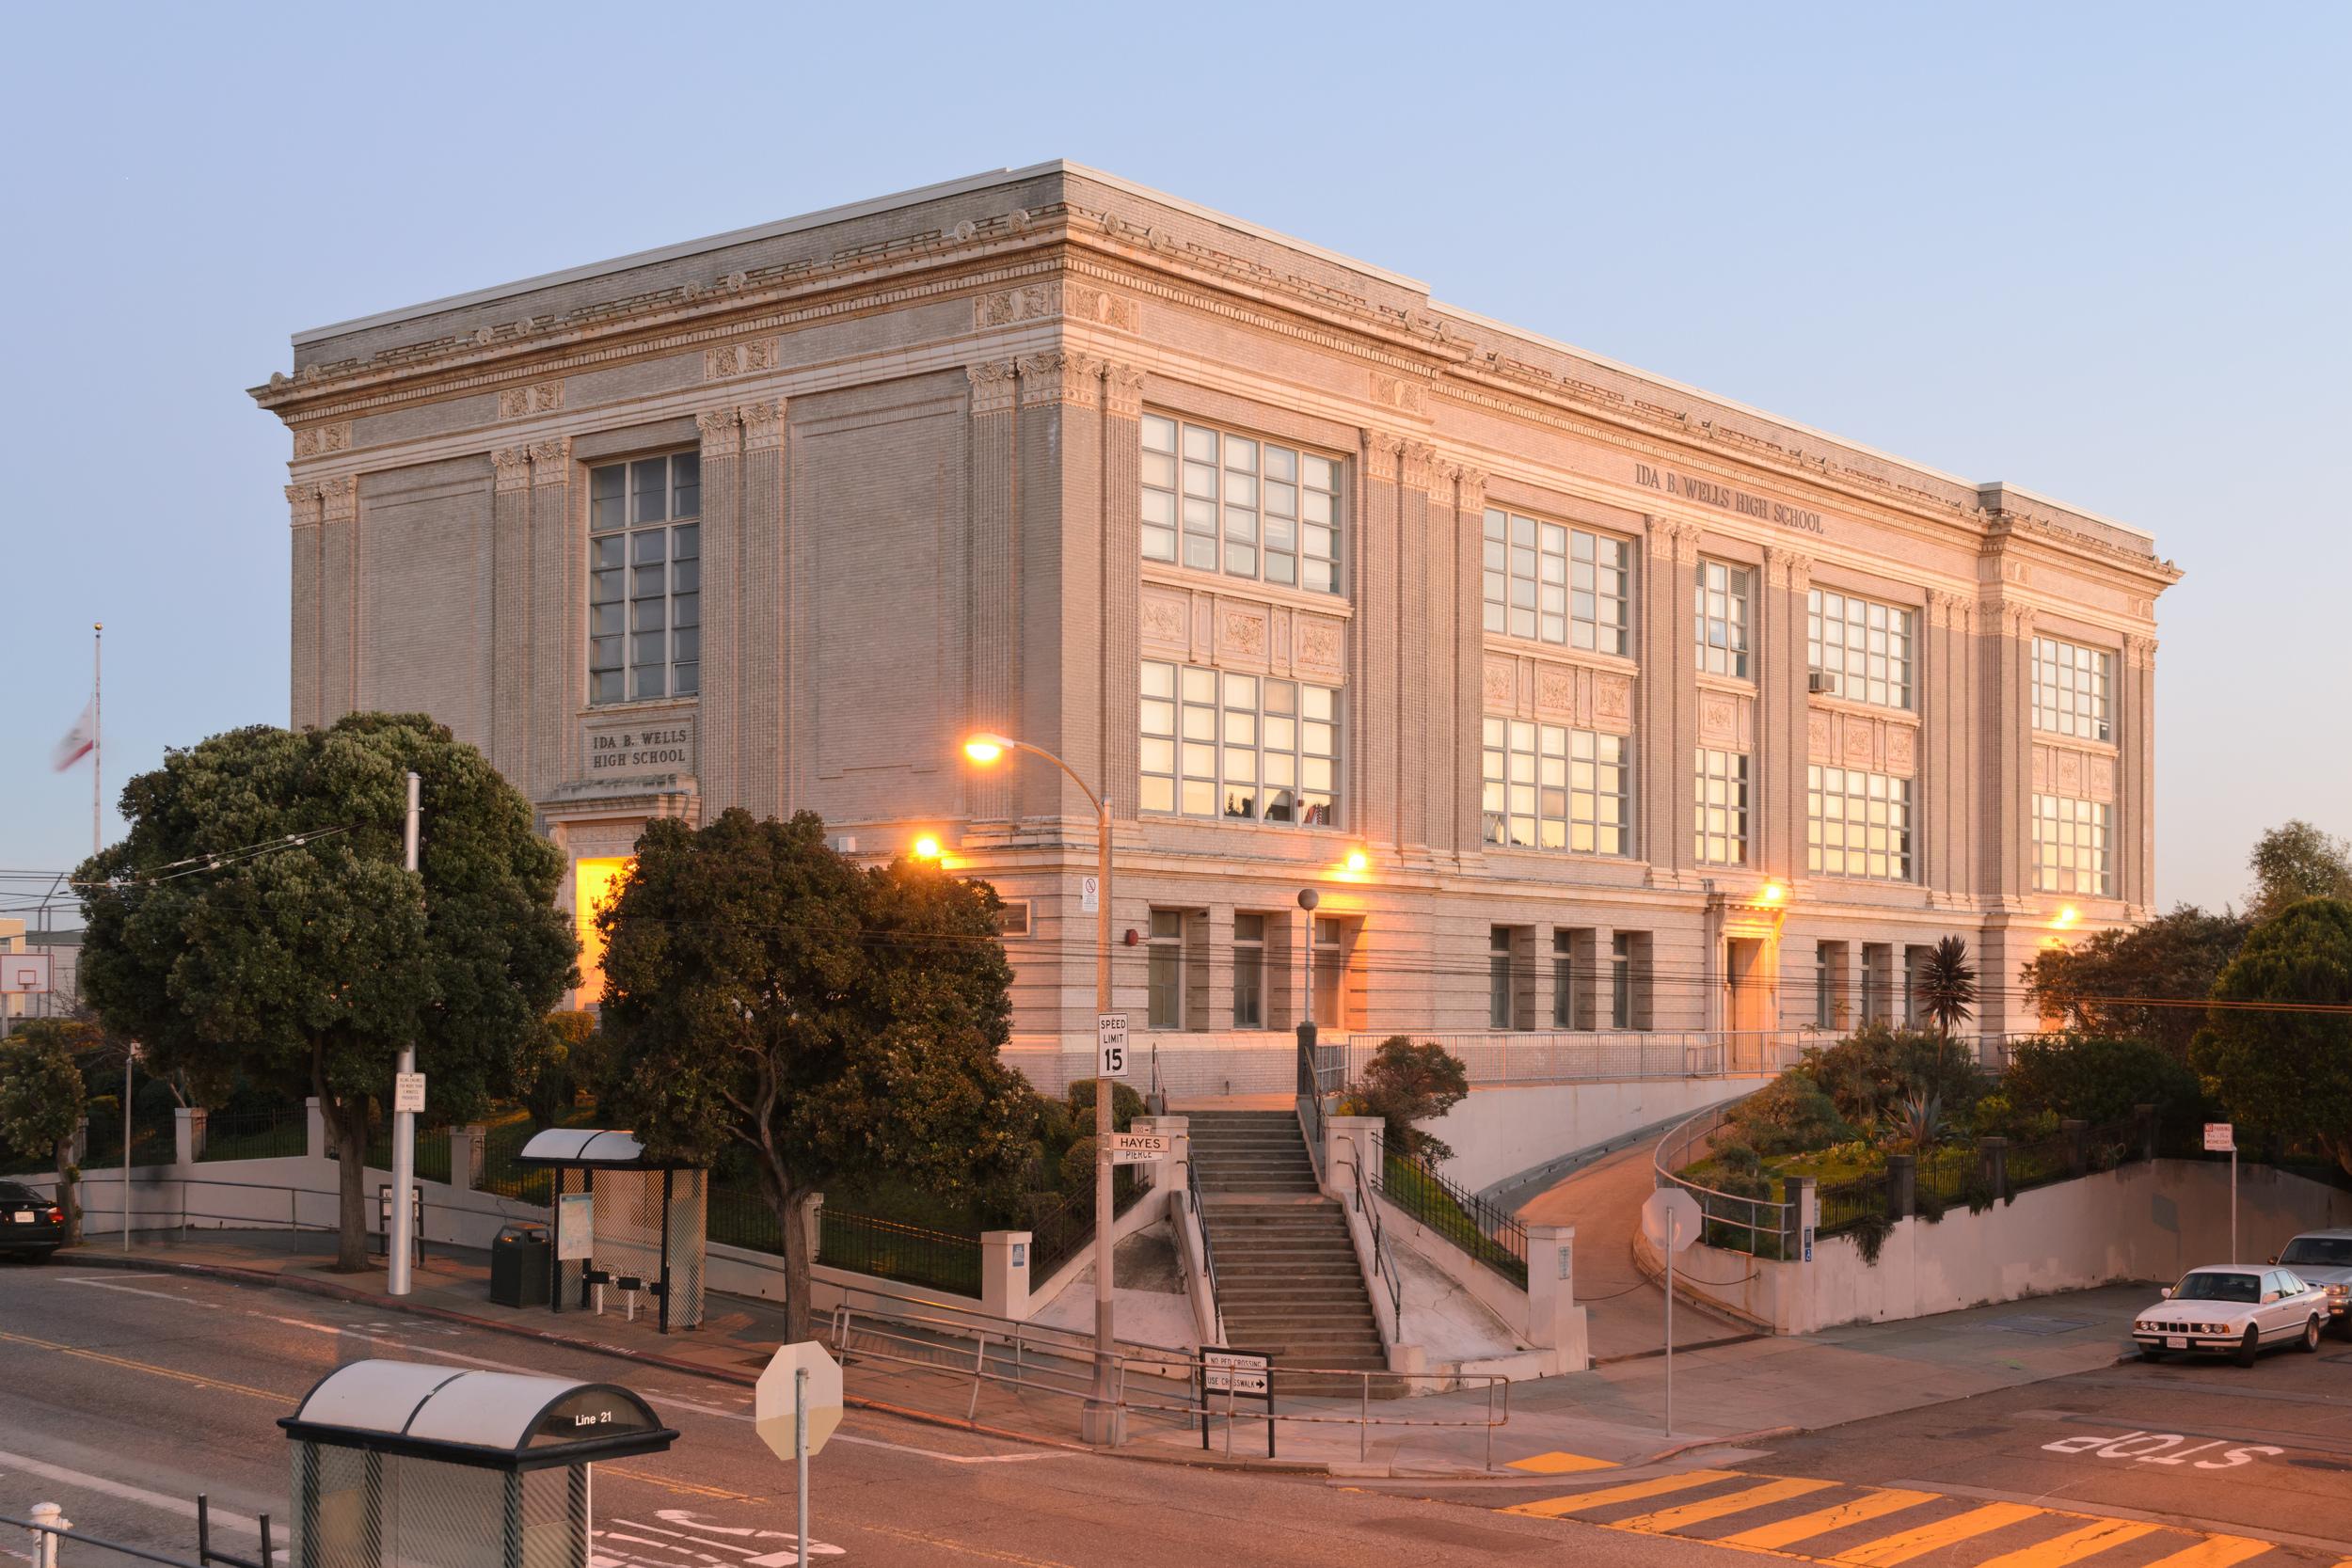 Ida_B_Wells_High_School_San_Francisco_January_2013_002.jpg